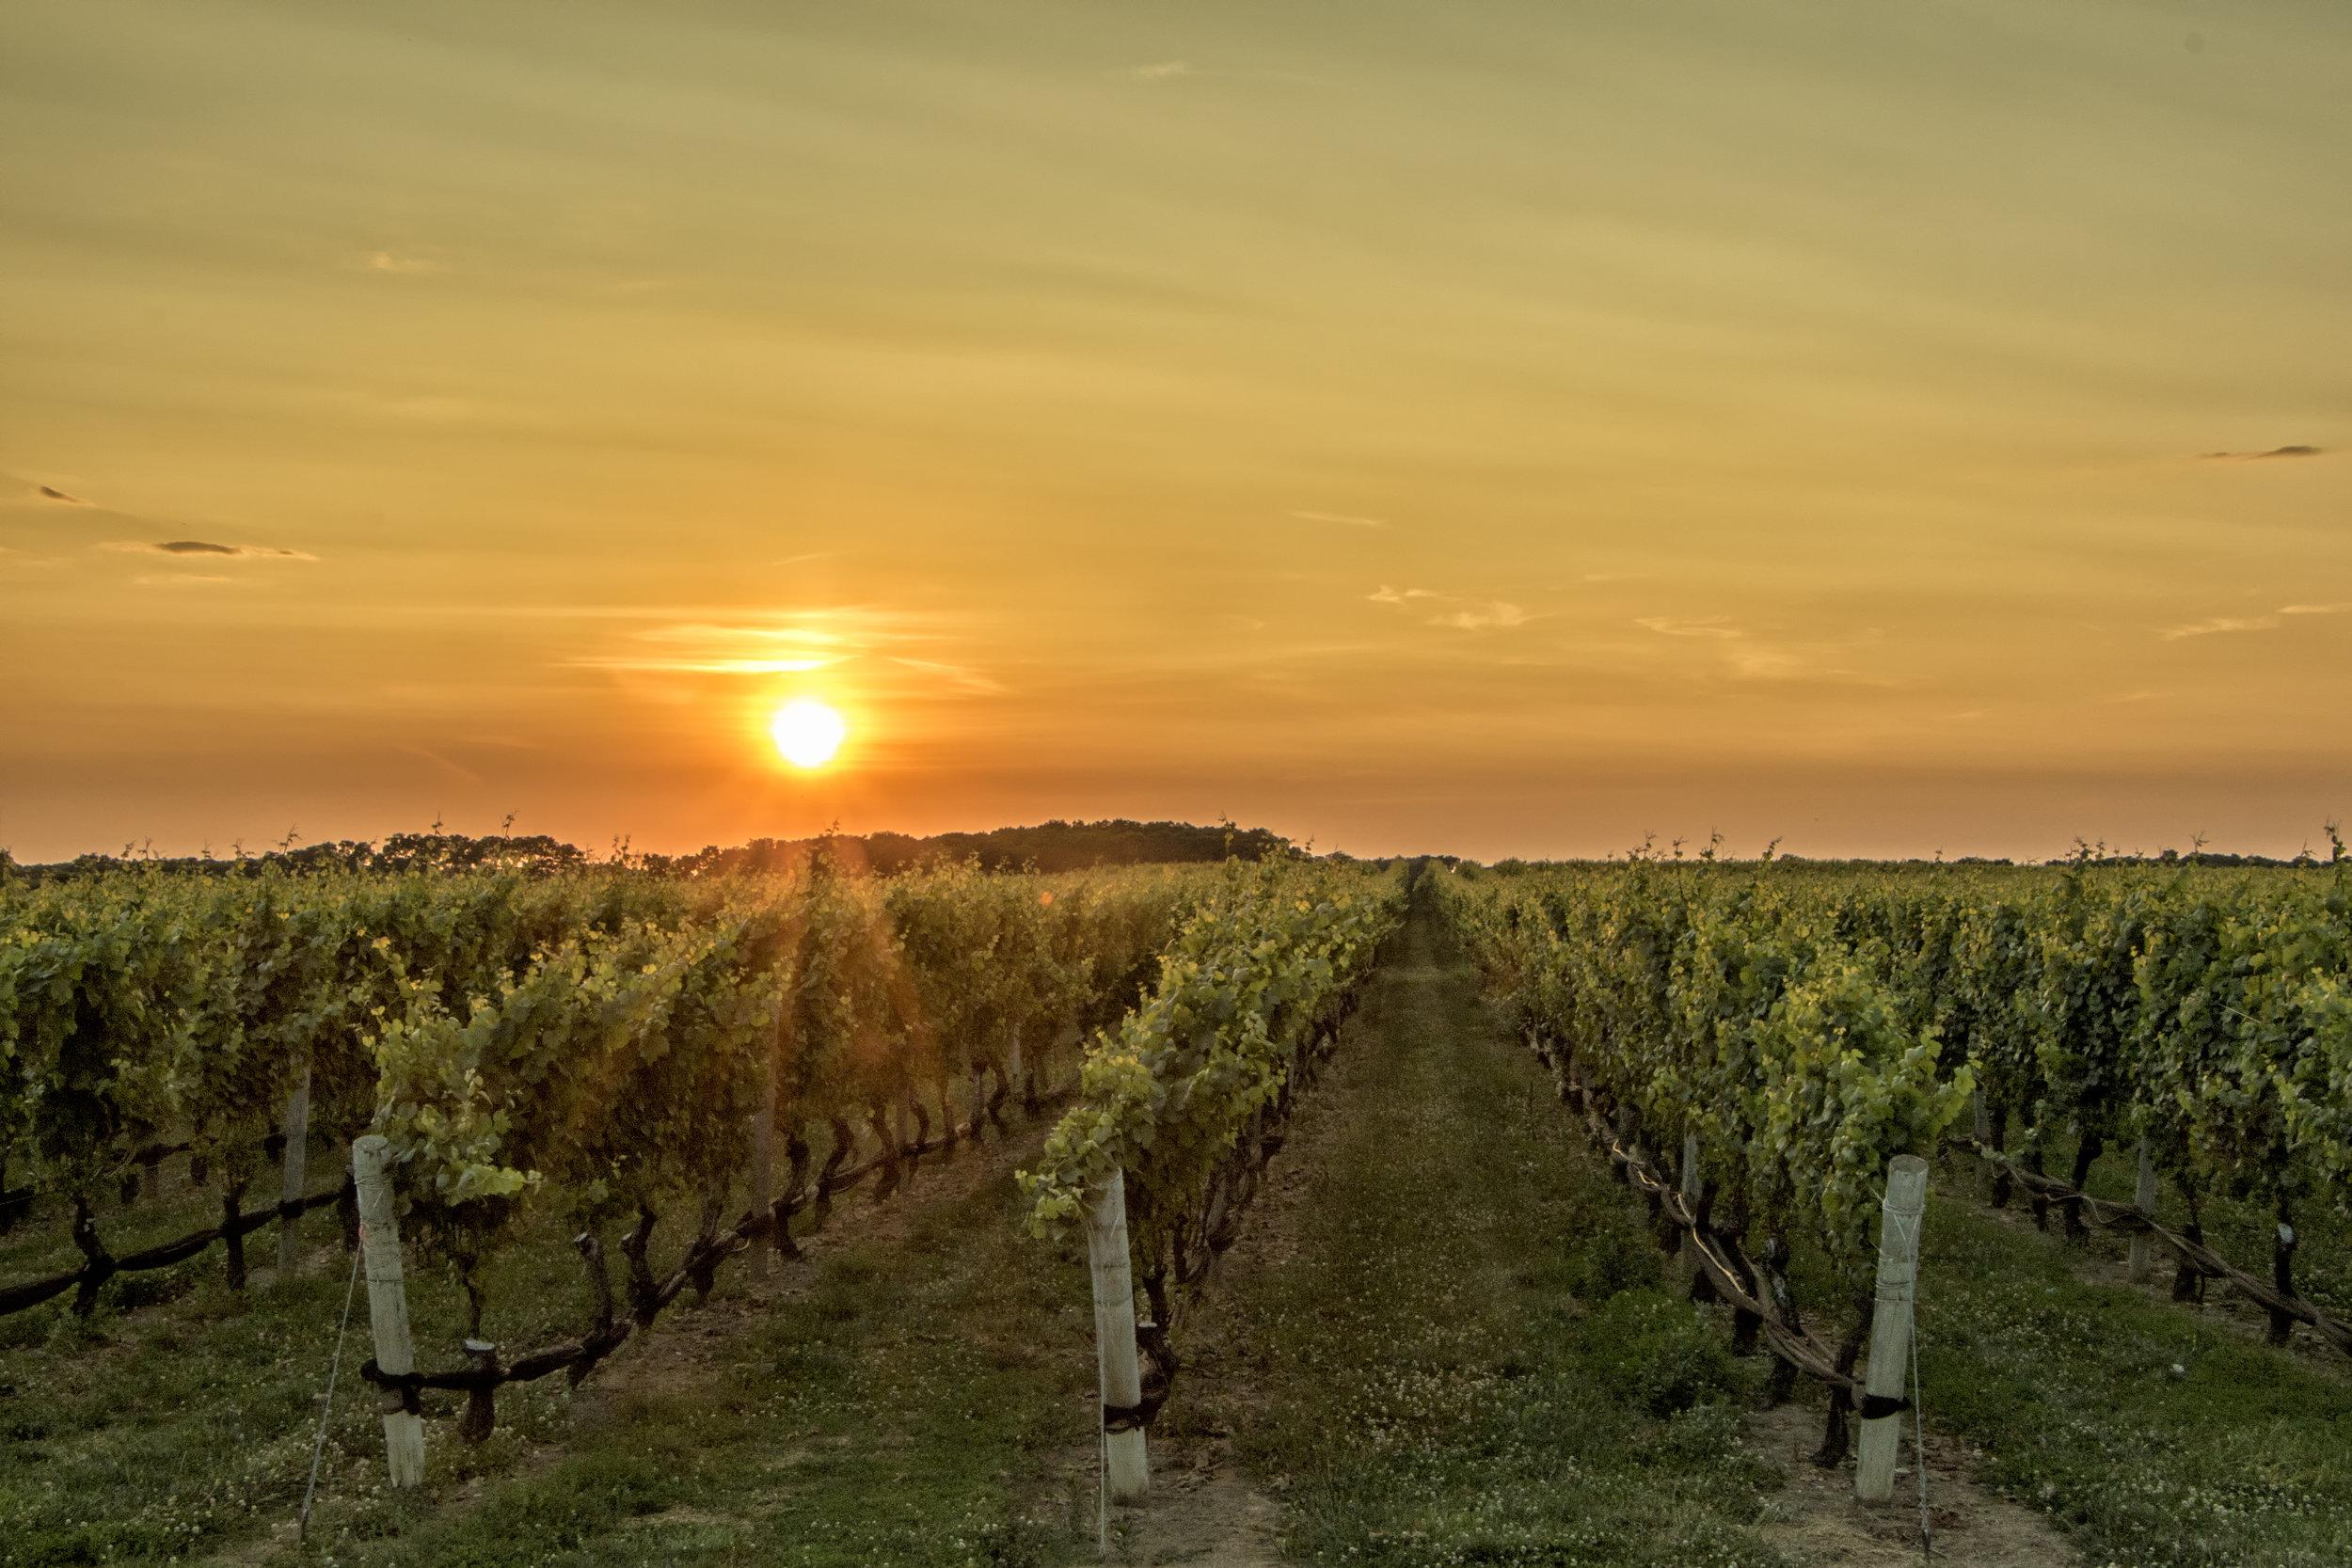 Sun setting behind grape vineyards